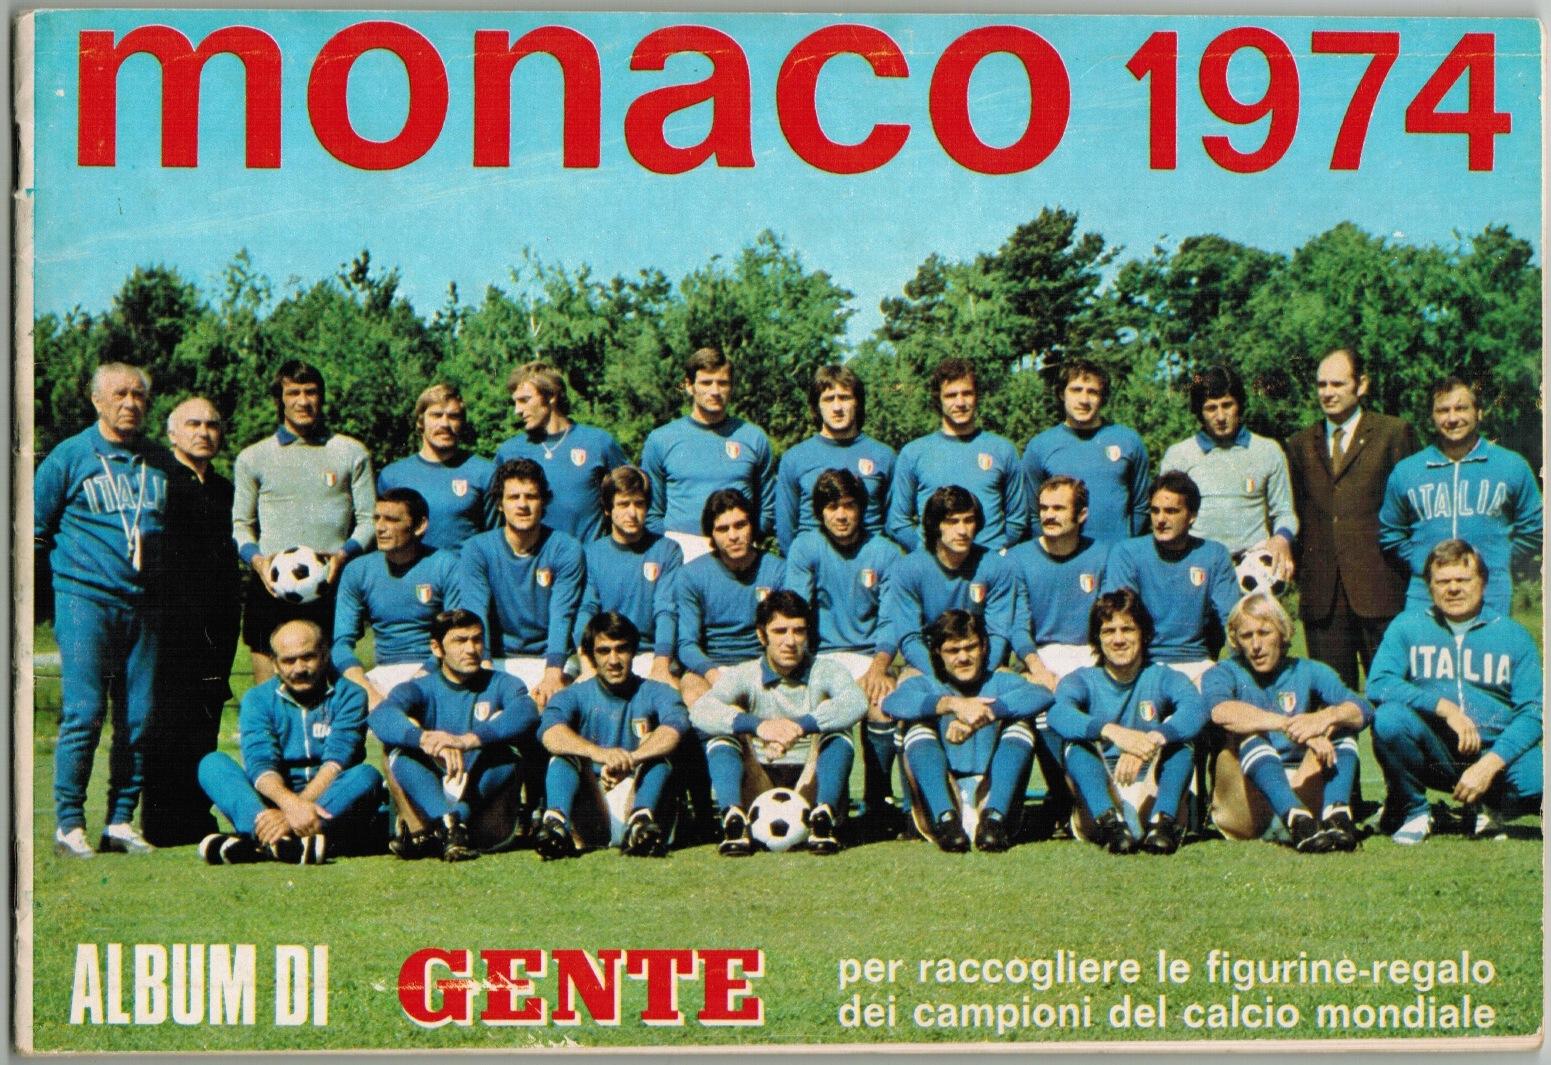 Monaco_1974_cover